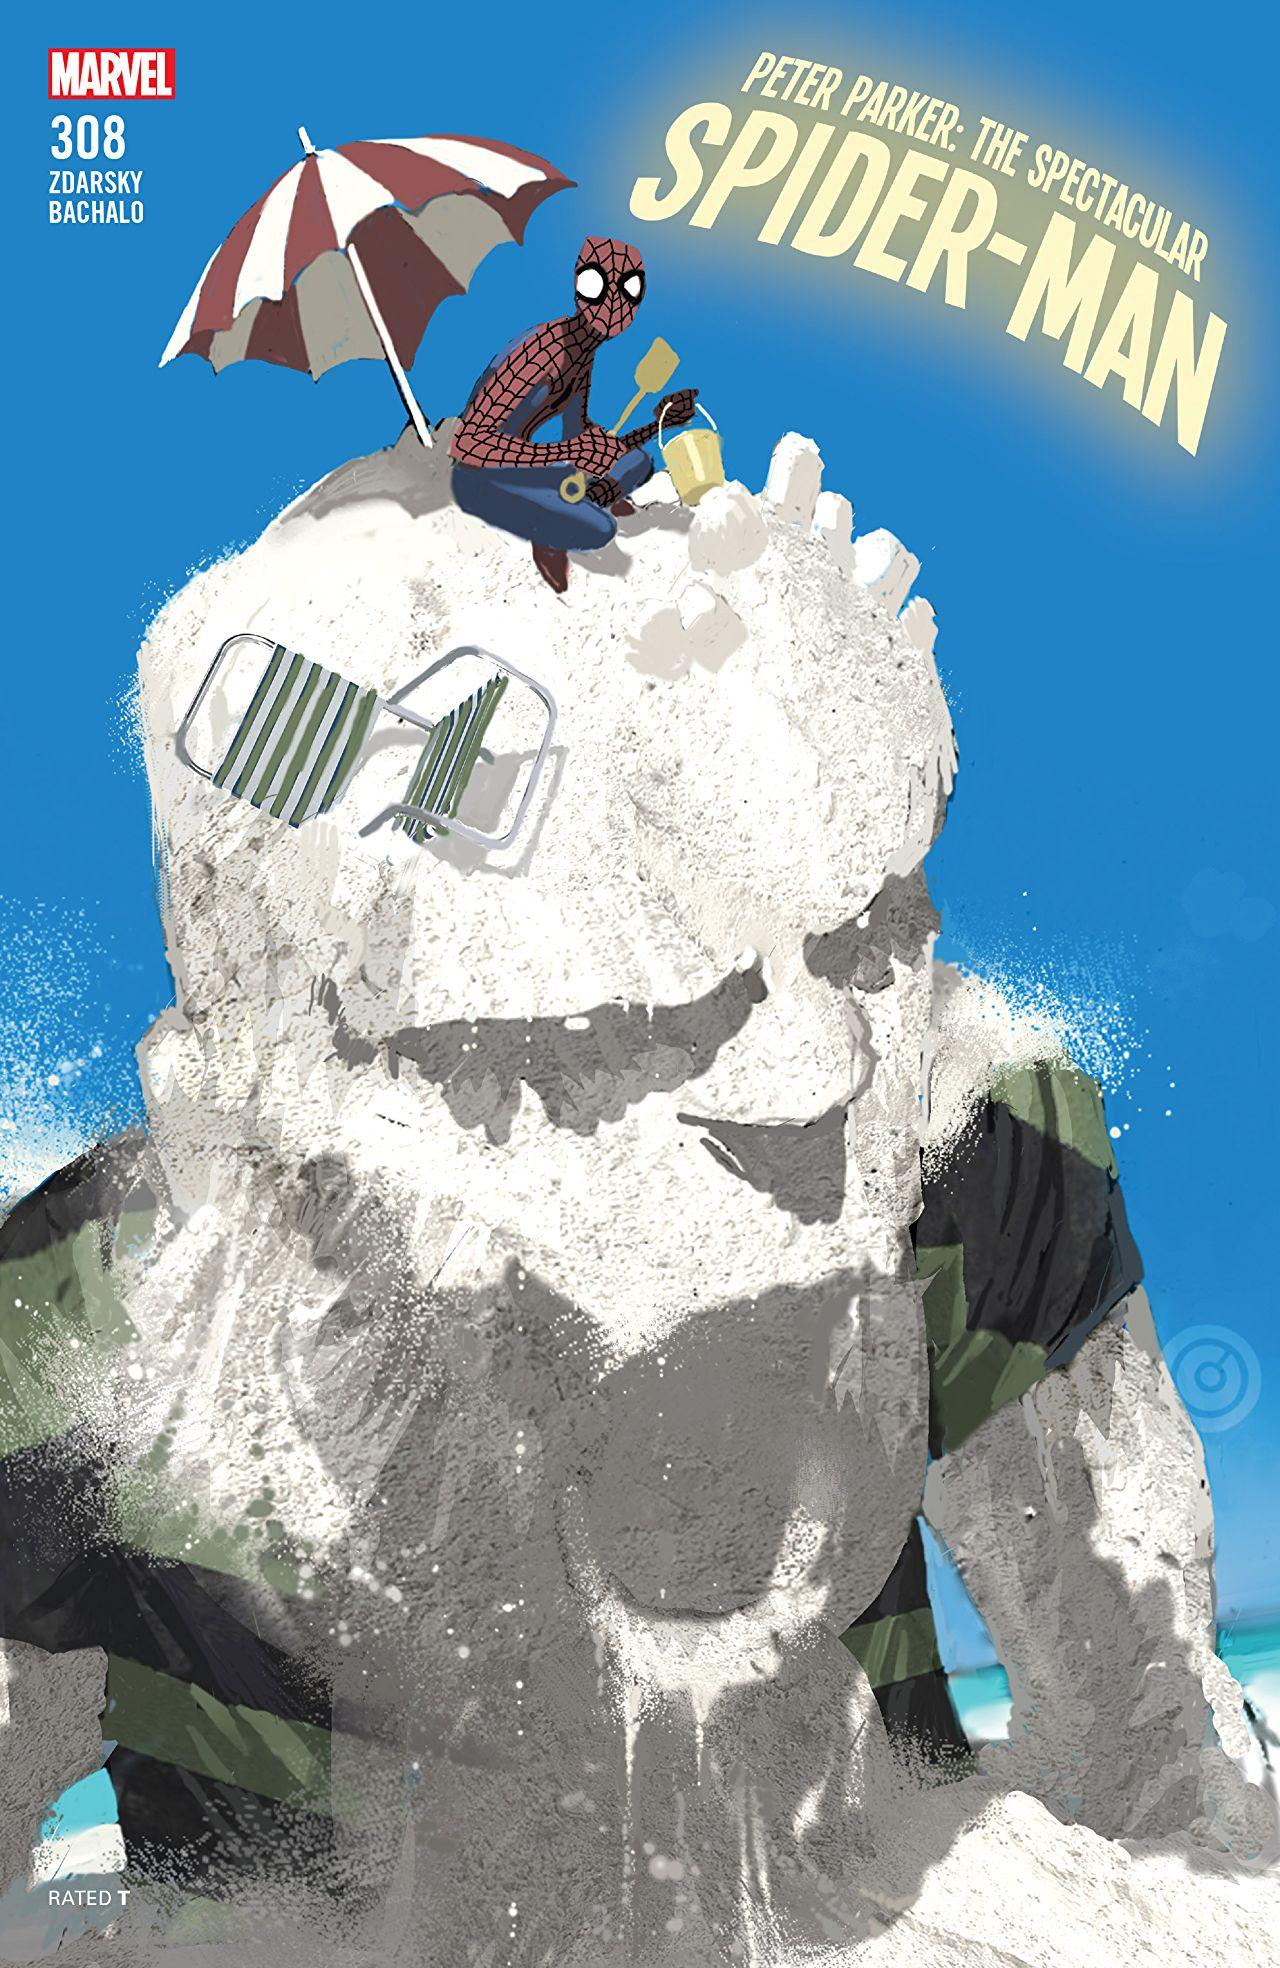 Peter Parker - The Spectacular Spider-Man 308